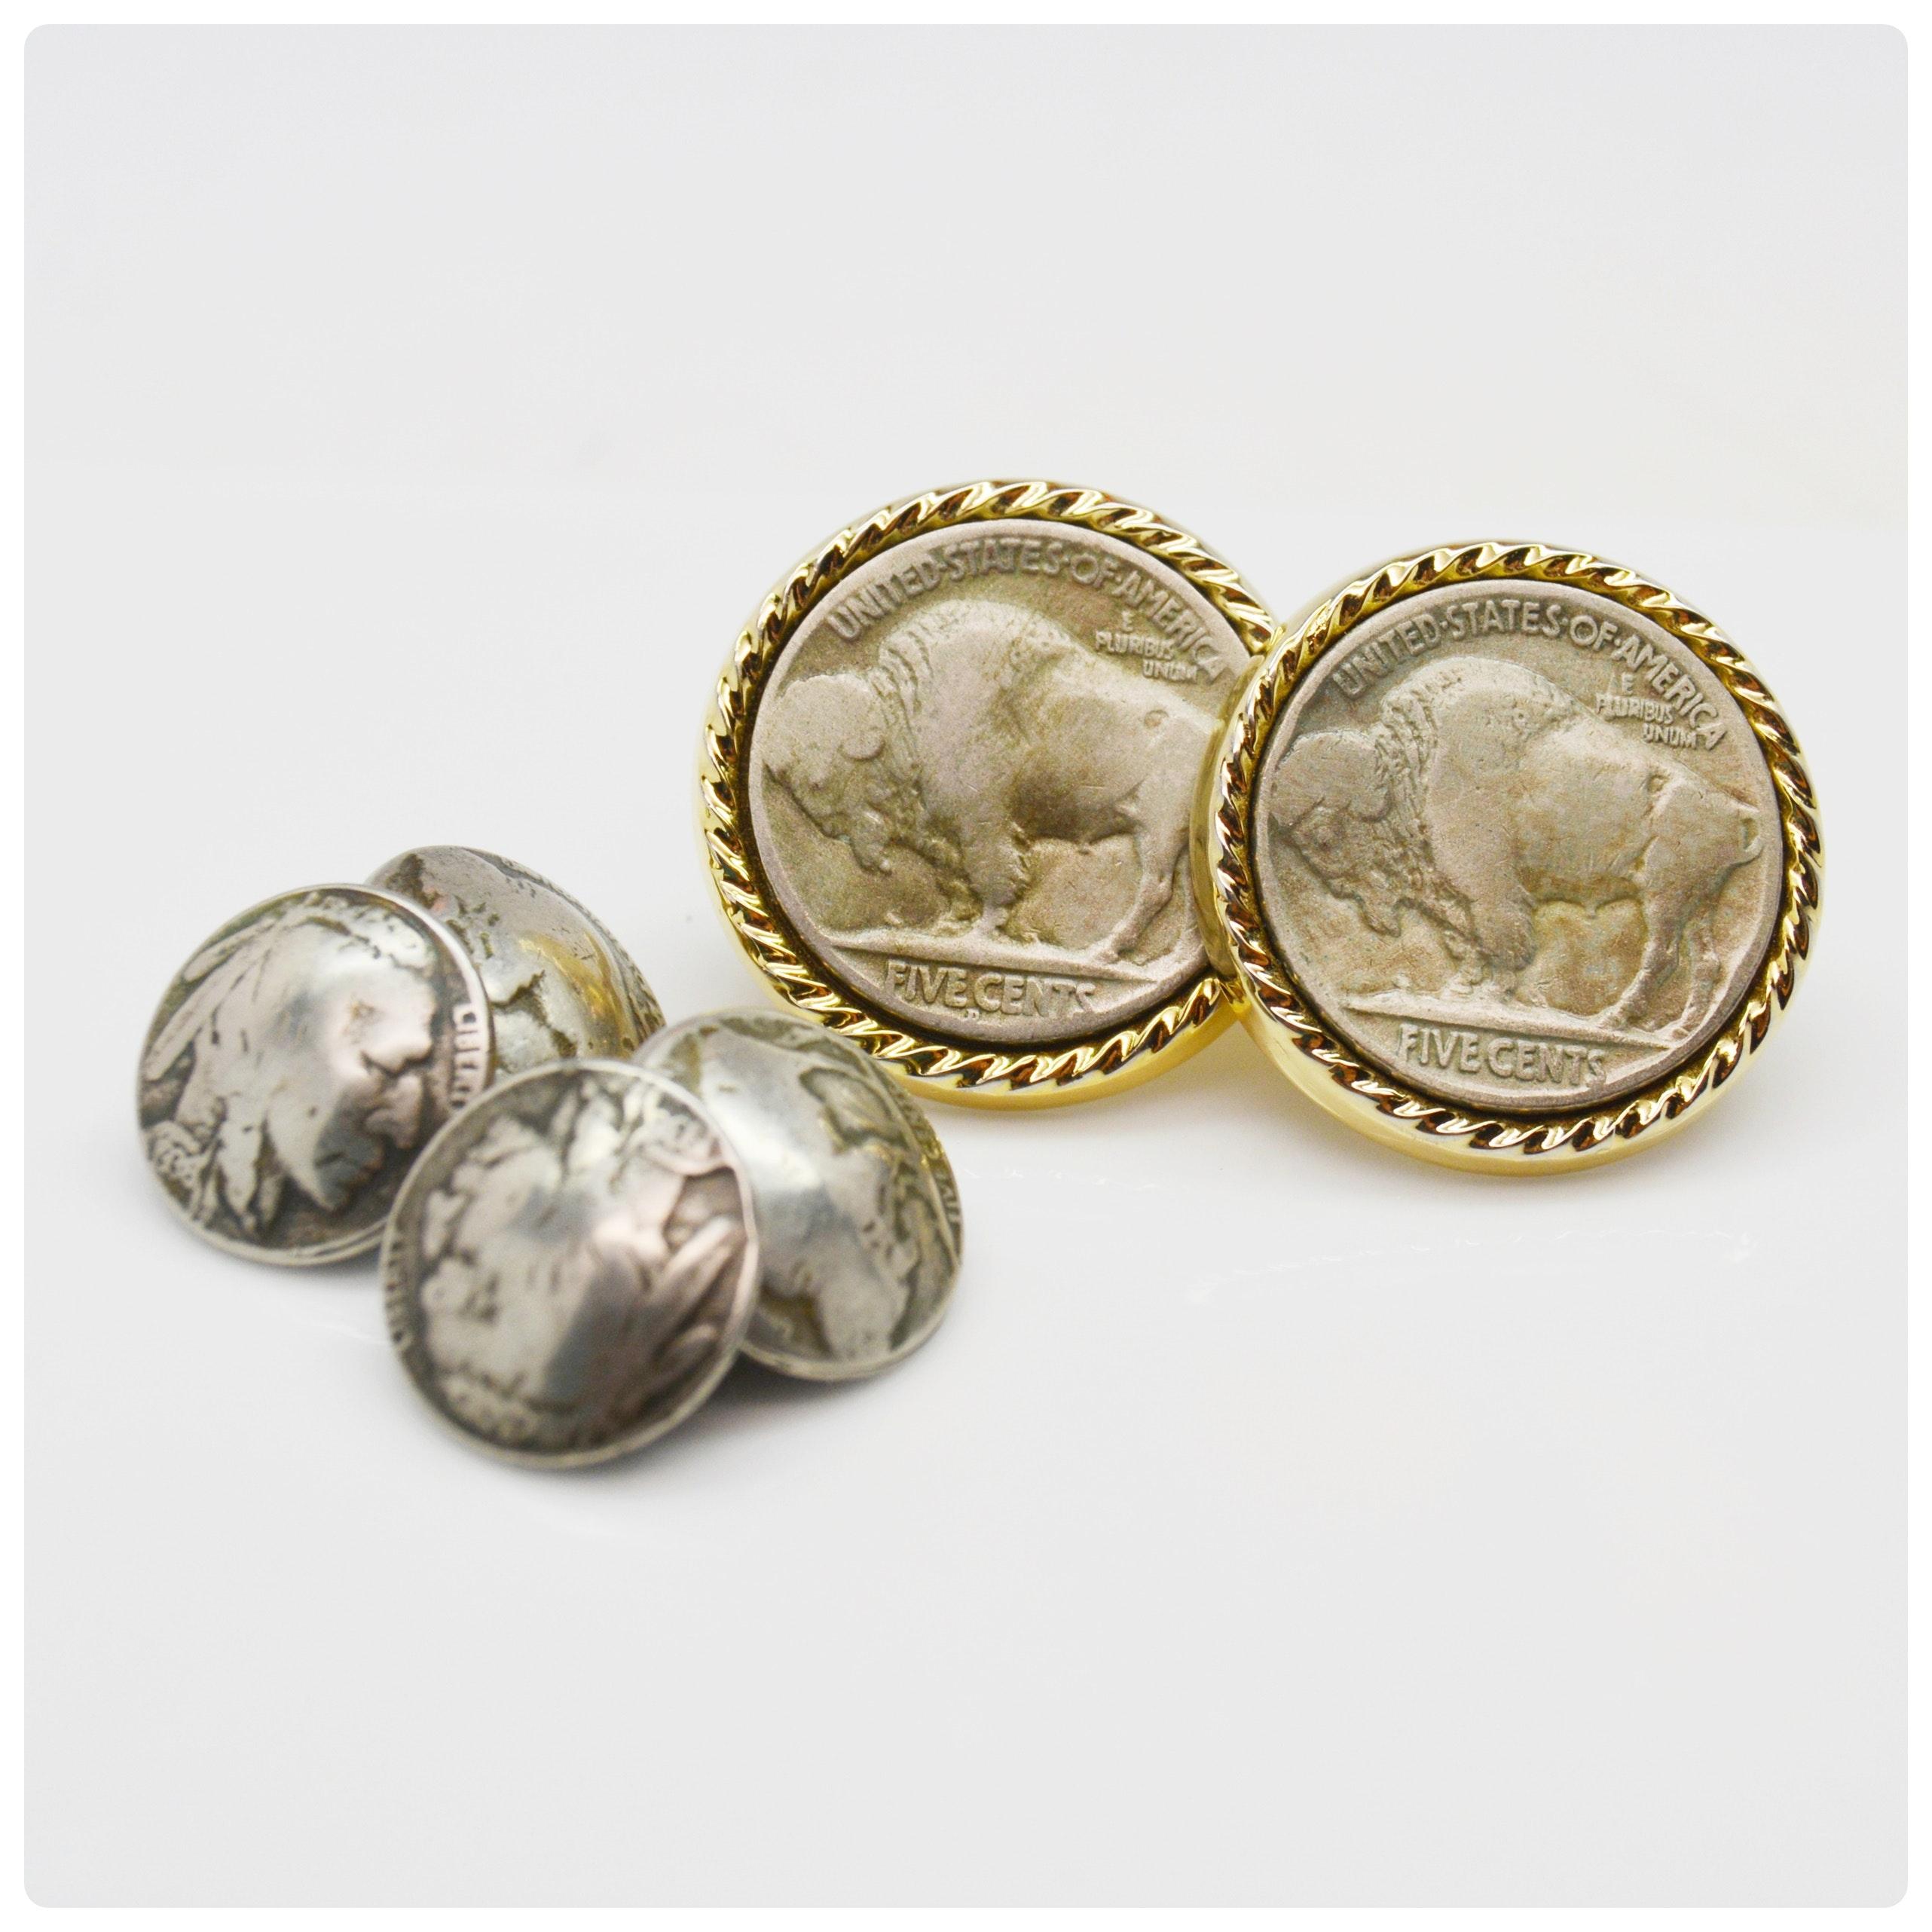 Buffalo Nickel Coin Cufflinks and Other Cufflinks